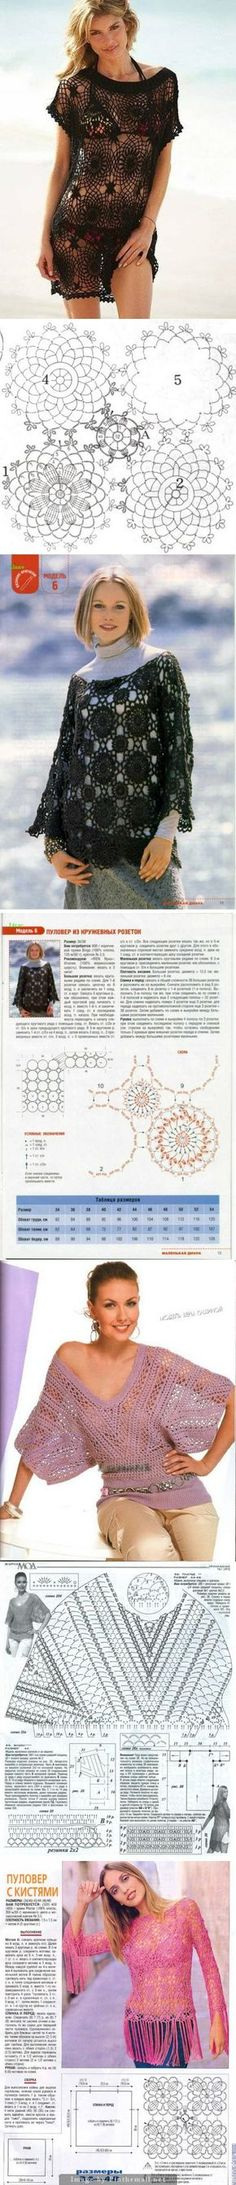 Crochet motif clothes -------------------- http://mirincondecrochet.wordpress.com/tag/blusas/page/13/